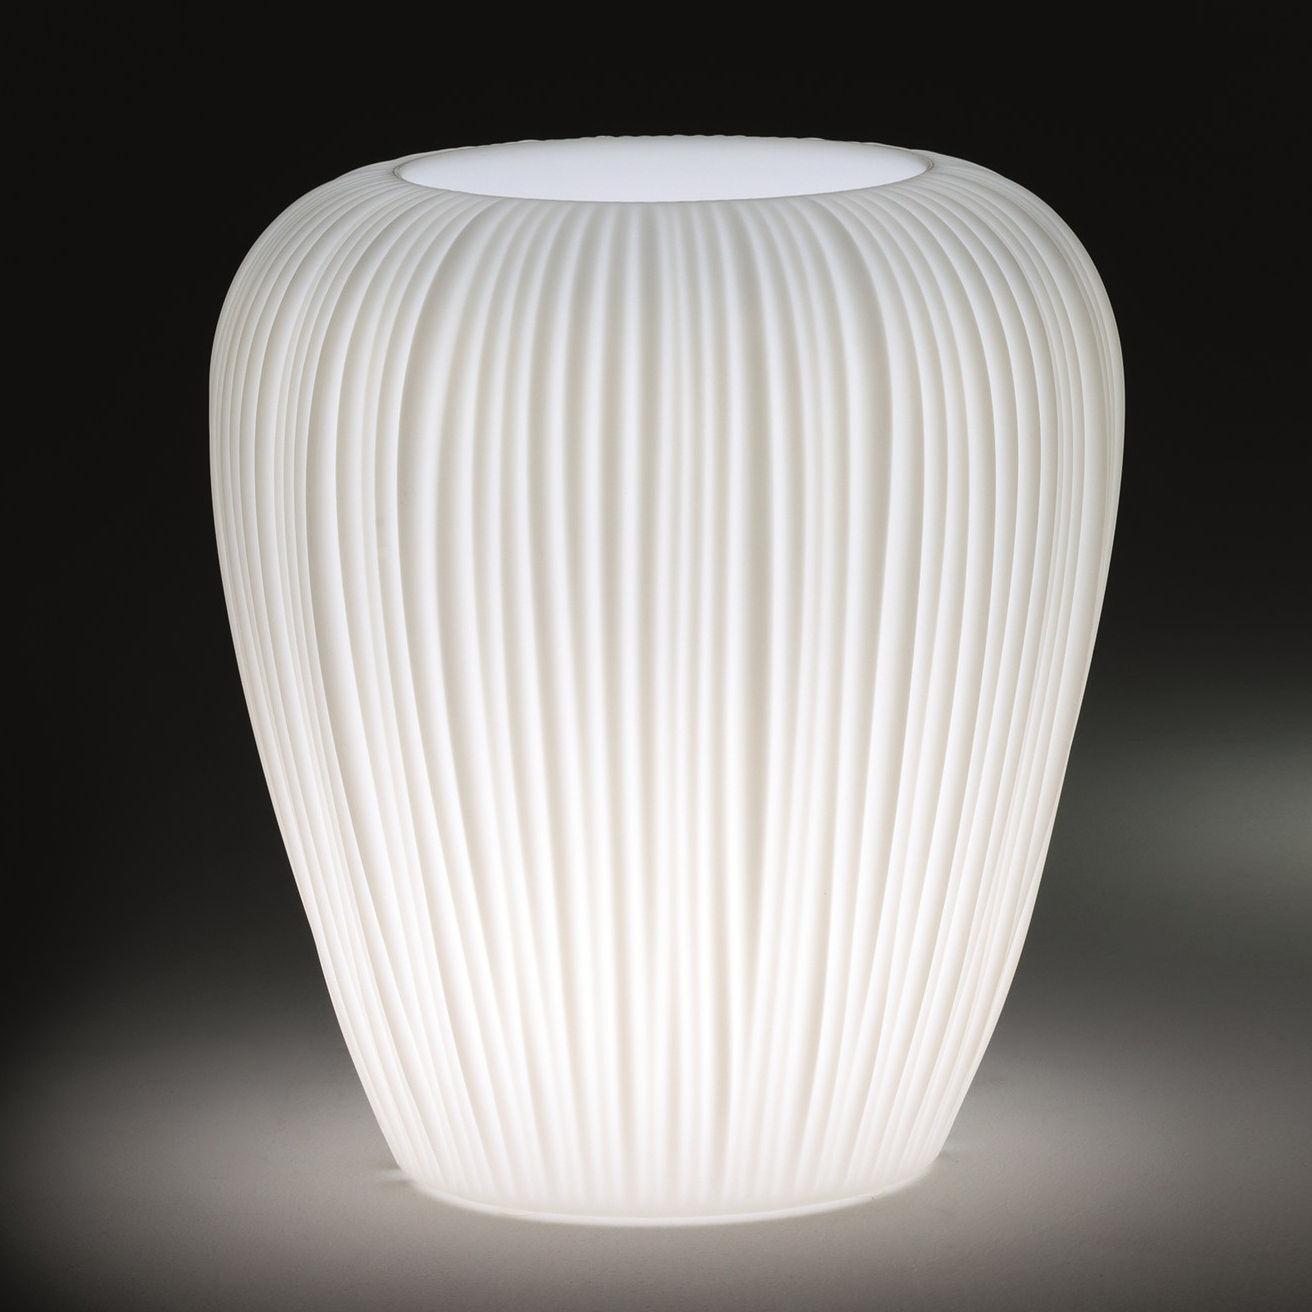 Lighting - Outdoor Lighting - Skin Small Luminous flowerpot by MyYour - White - Poleasy®